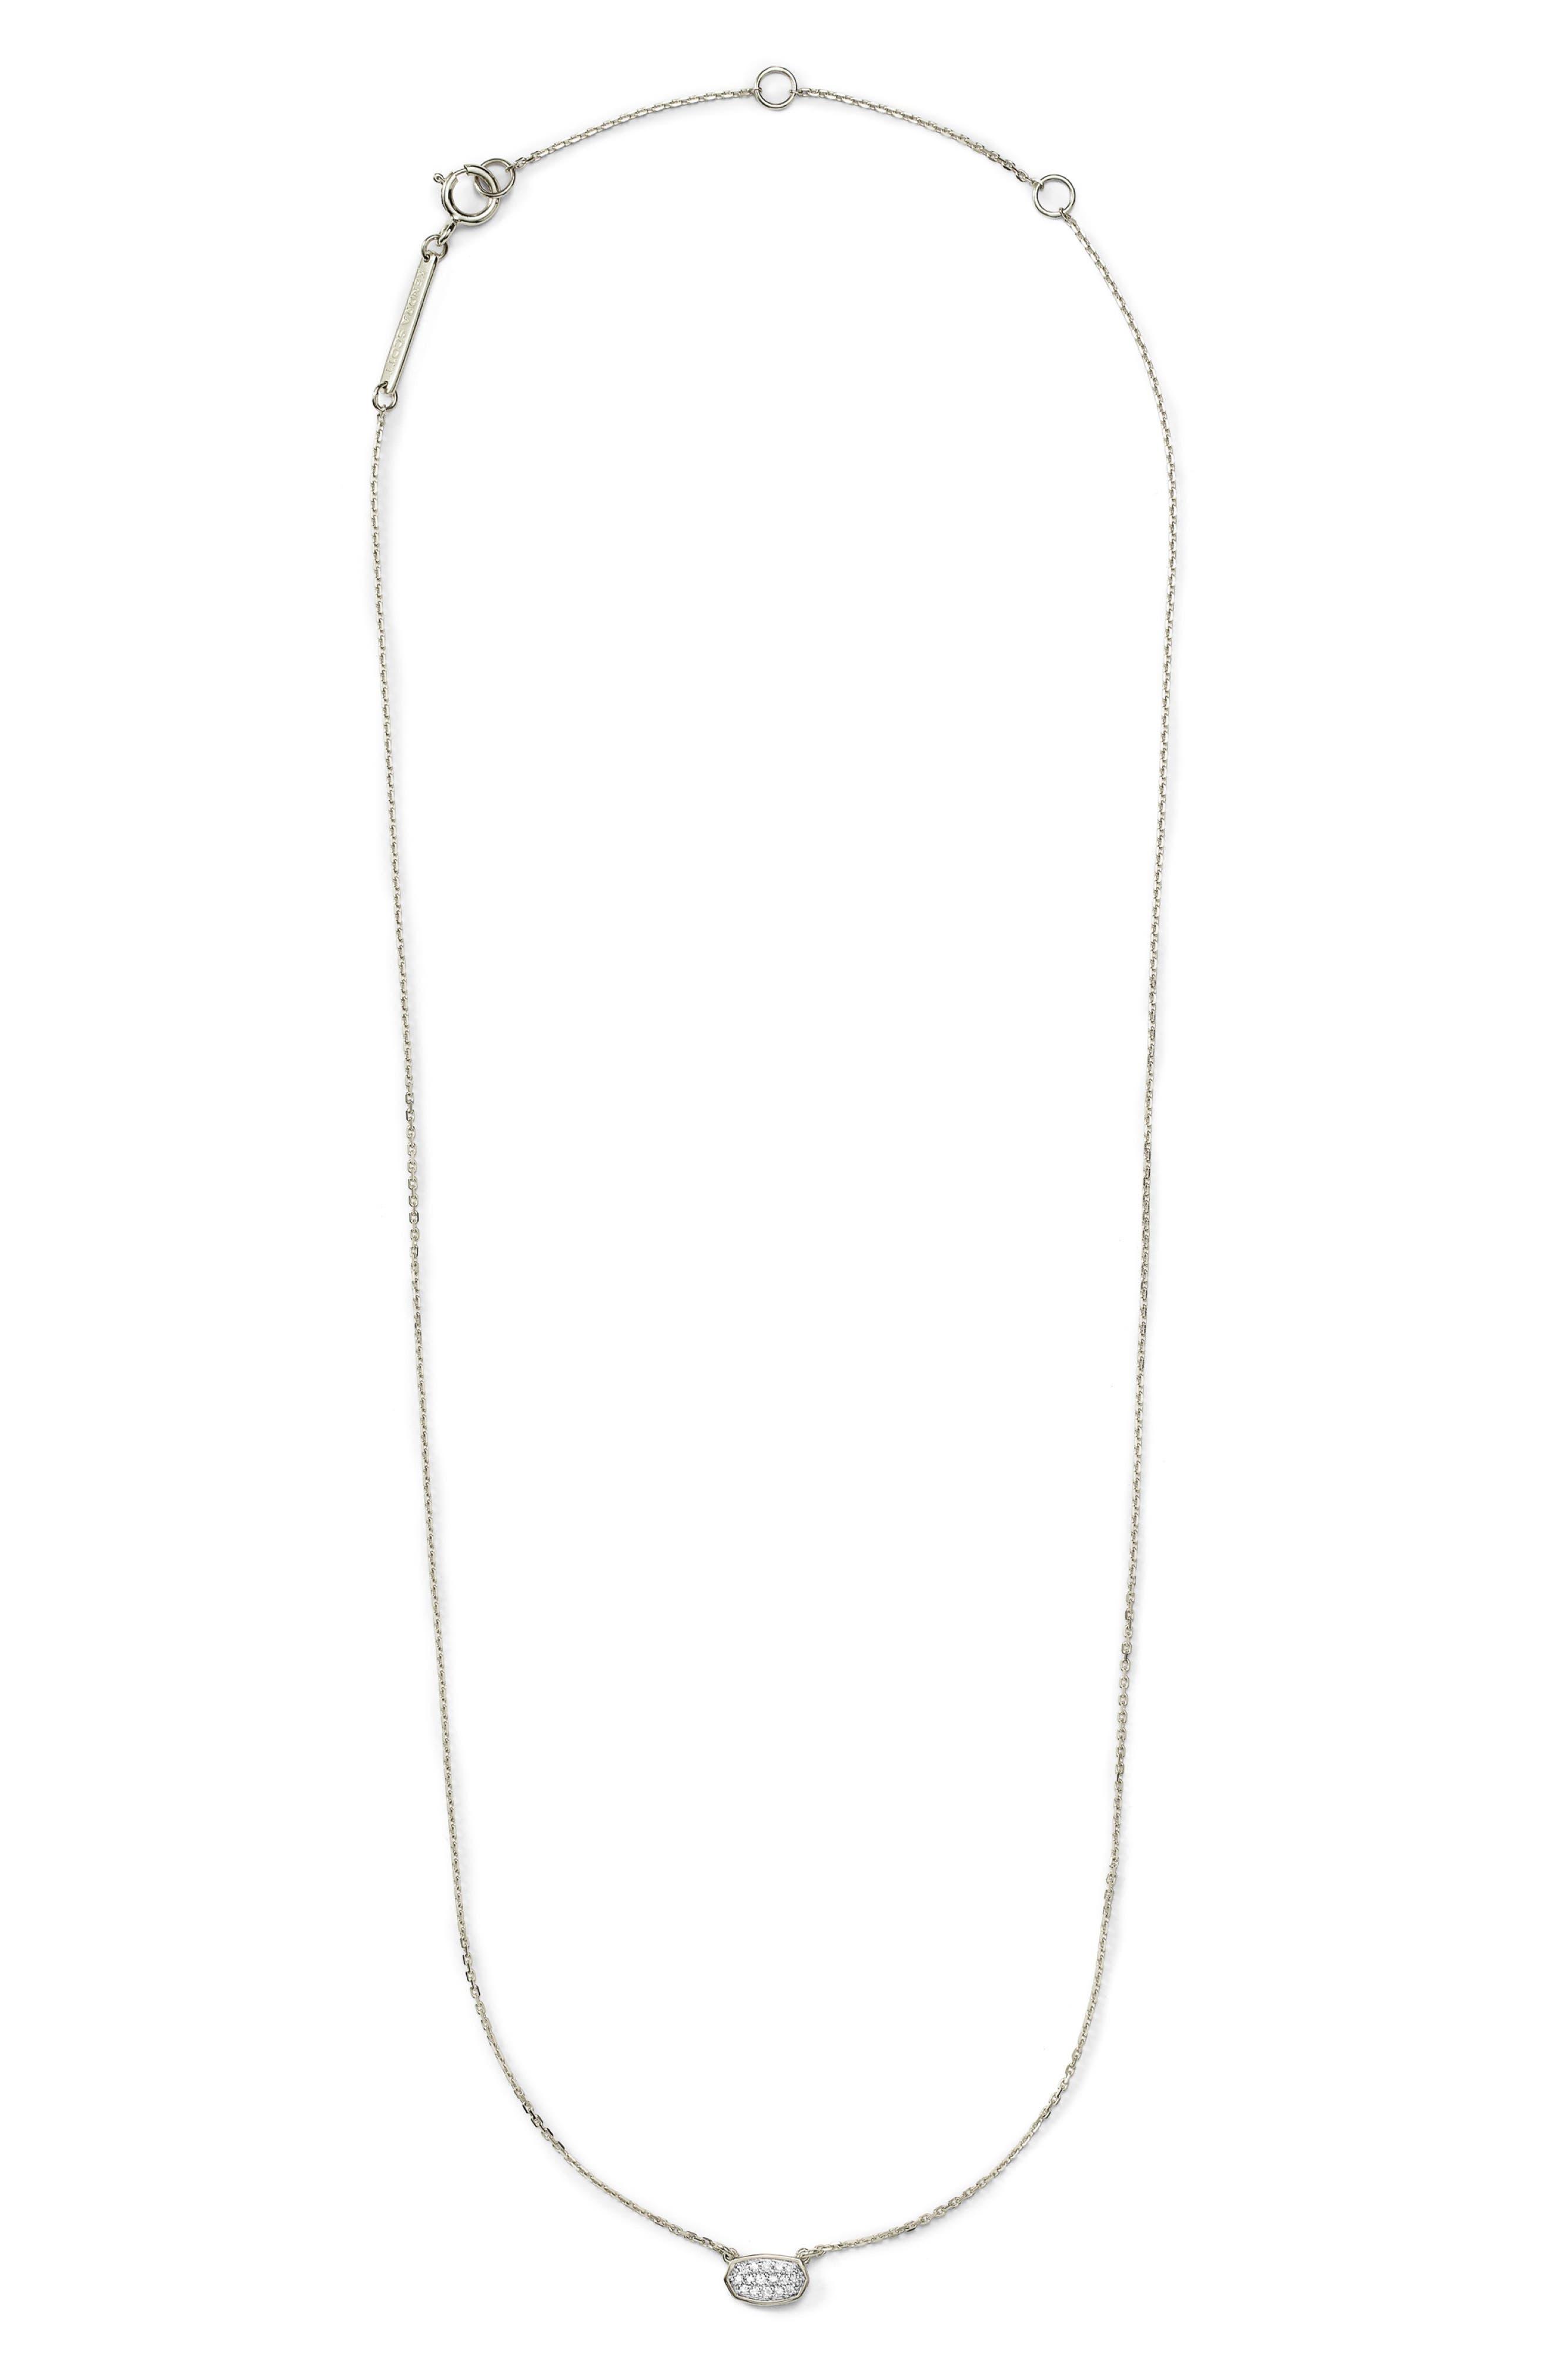 Marisa Diamond Necklace In 14K Yellow Gold Or 14K White Gold, 18 in 14K Wgld White Diamond